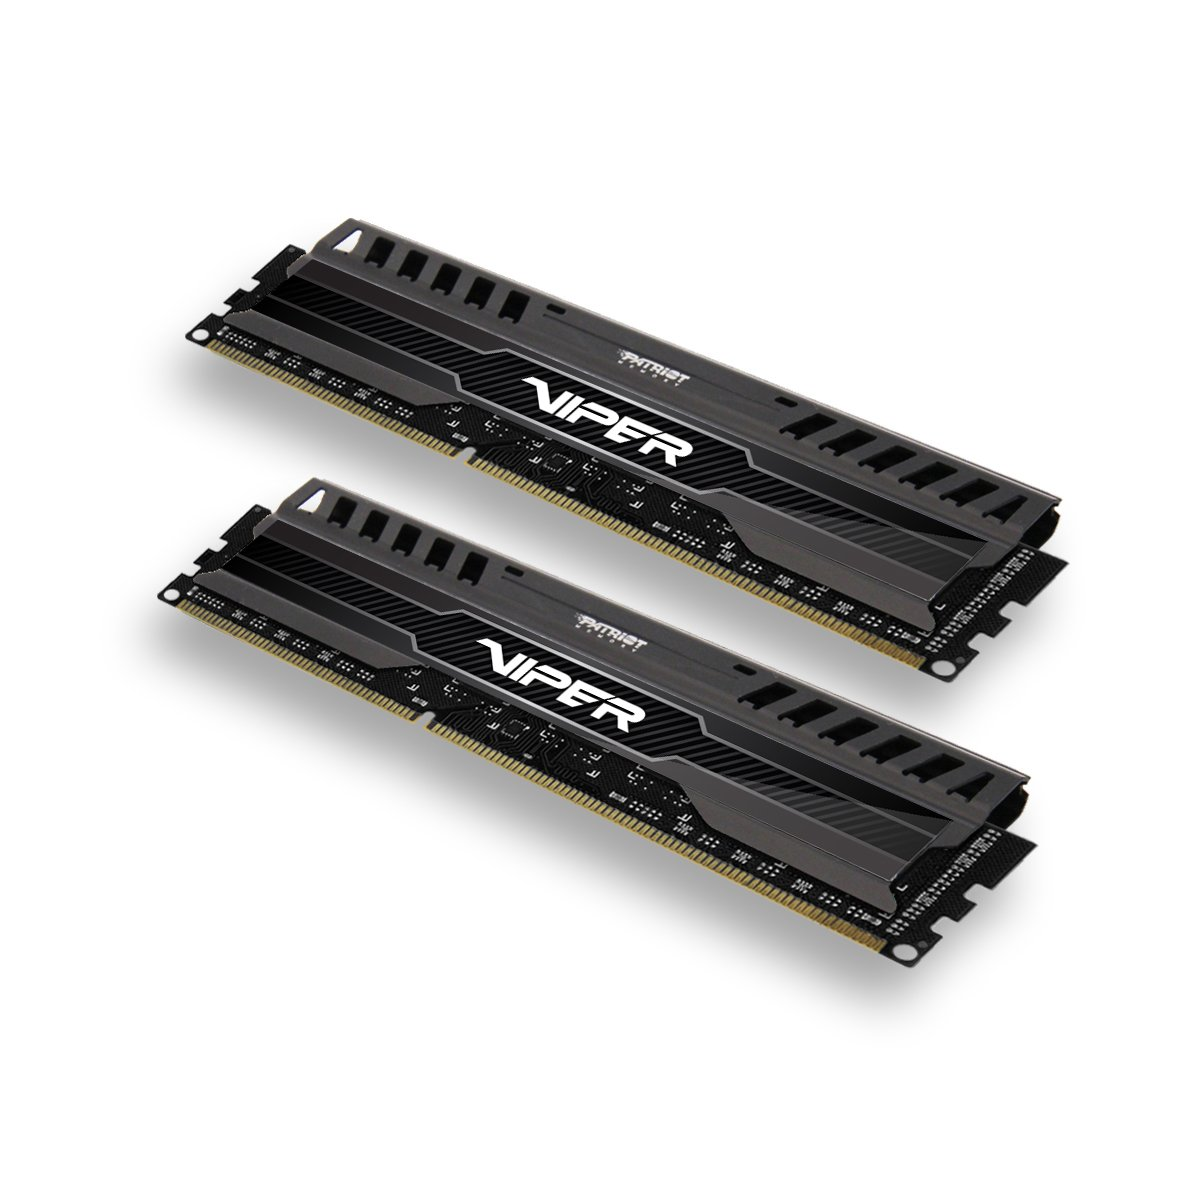 Patriot 16GB(2x8GB) Viper III DDR3 1866MHz (PC3 15000) CL10 Desktop Memory With Black Mamba Heatsink - PV316G186C0K